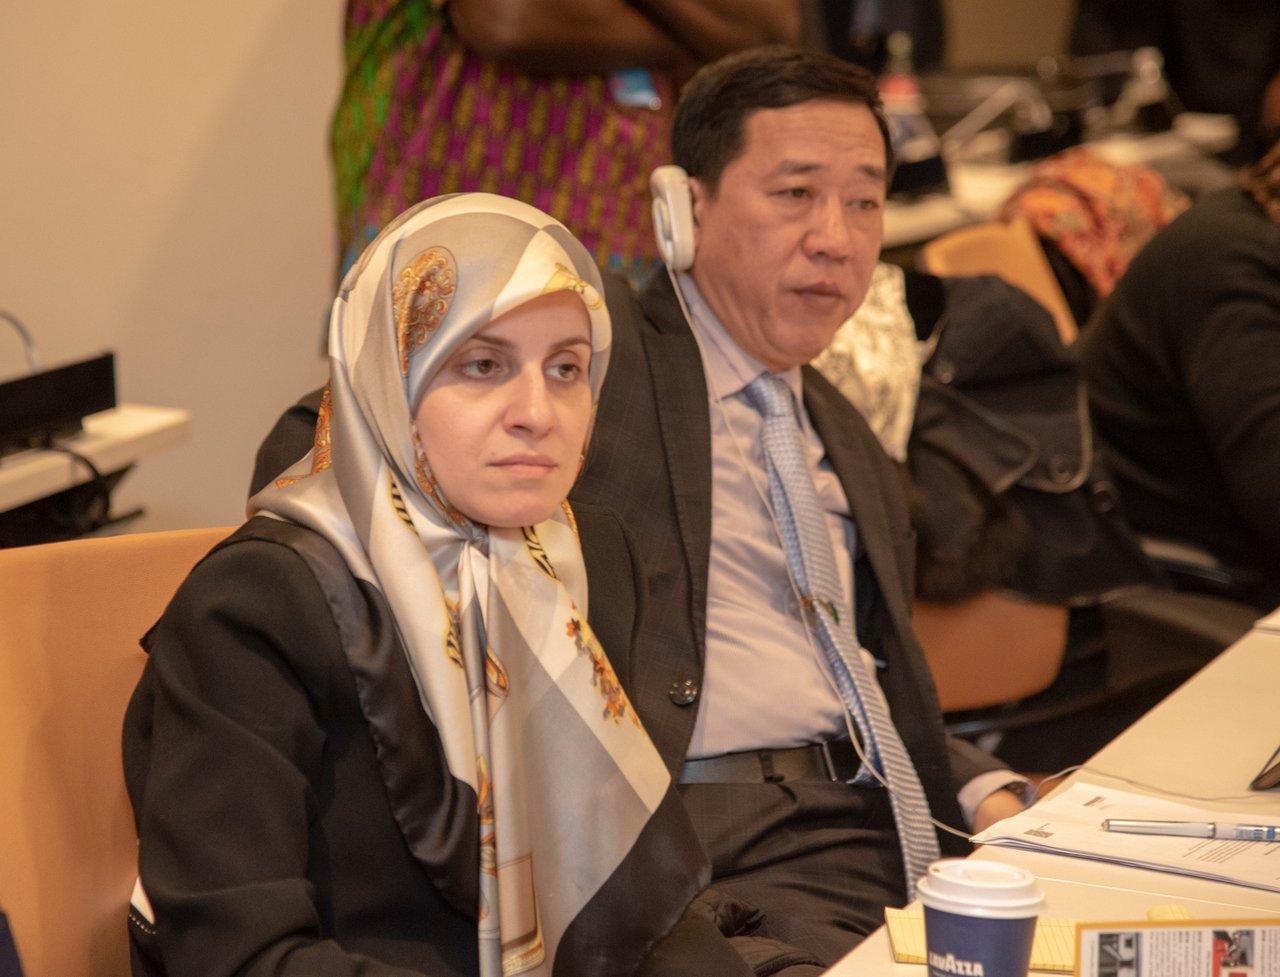 UNFPA Population & Development Meeting photo dsc_0087_47533084831_o.jpg